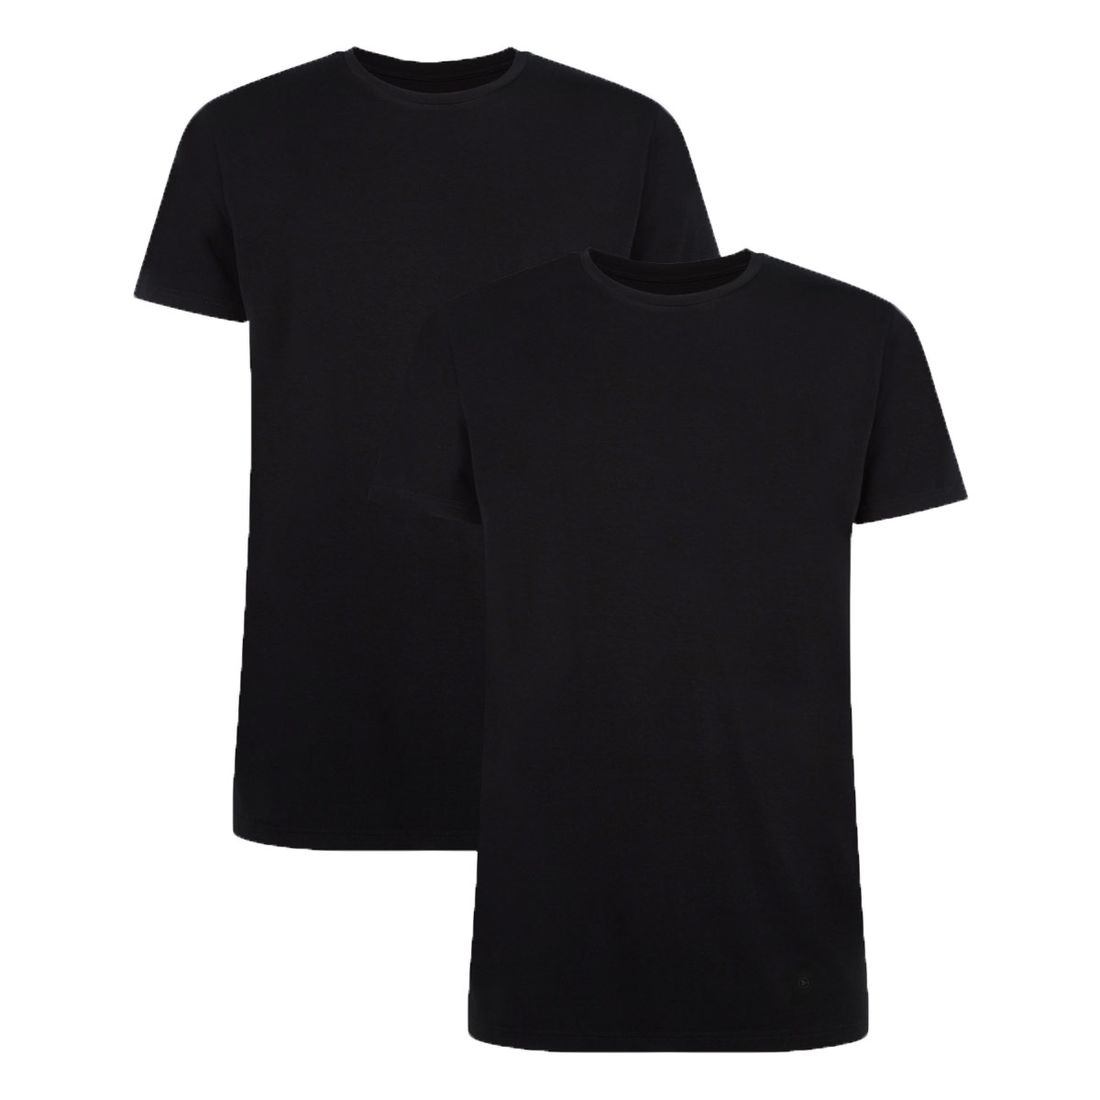 Afbeelding van Bamboo Basics ruben 2 pack O hals shirt zwart heren